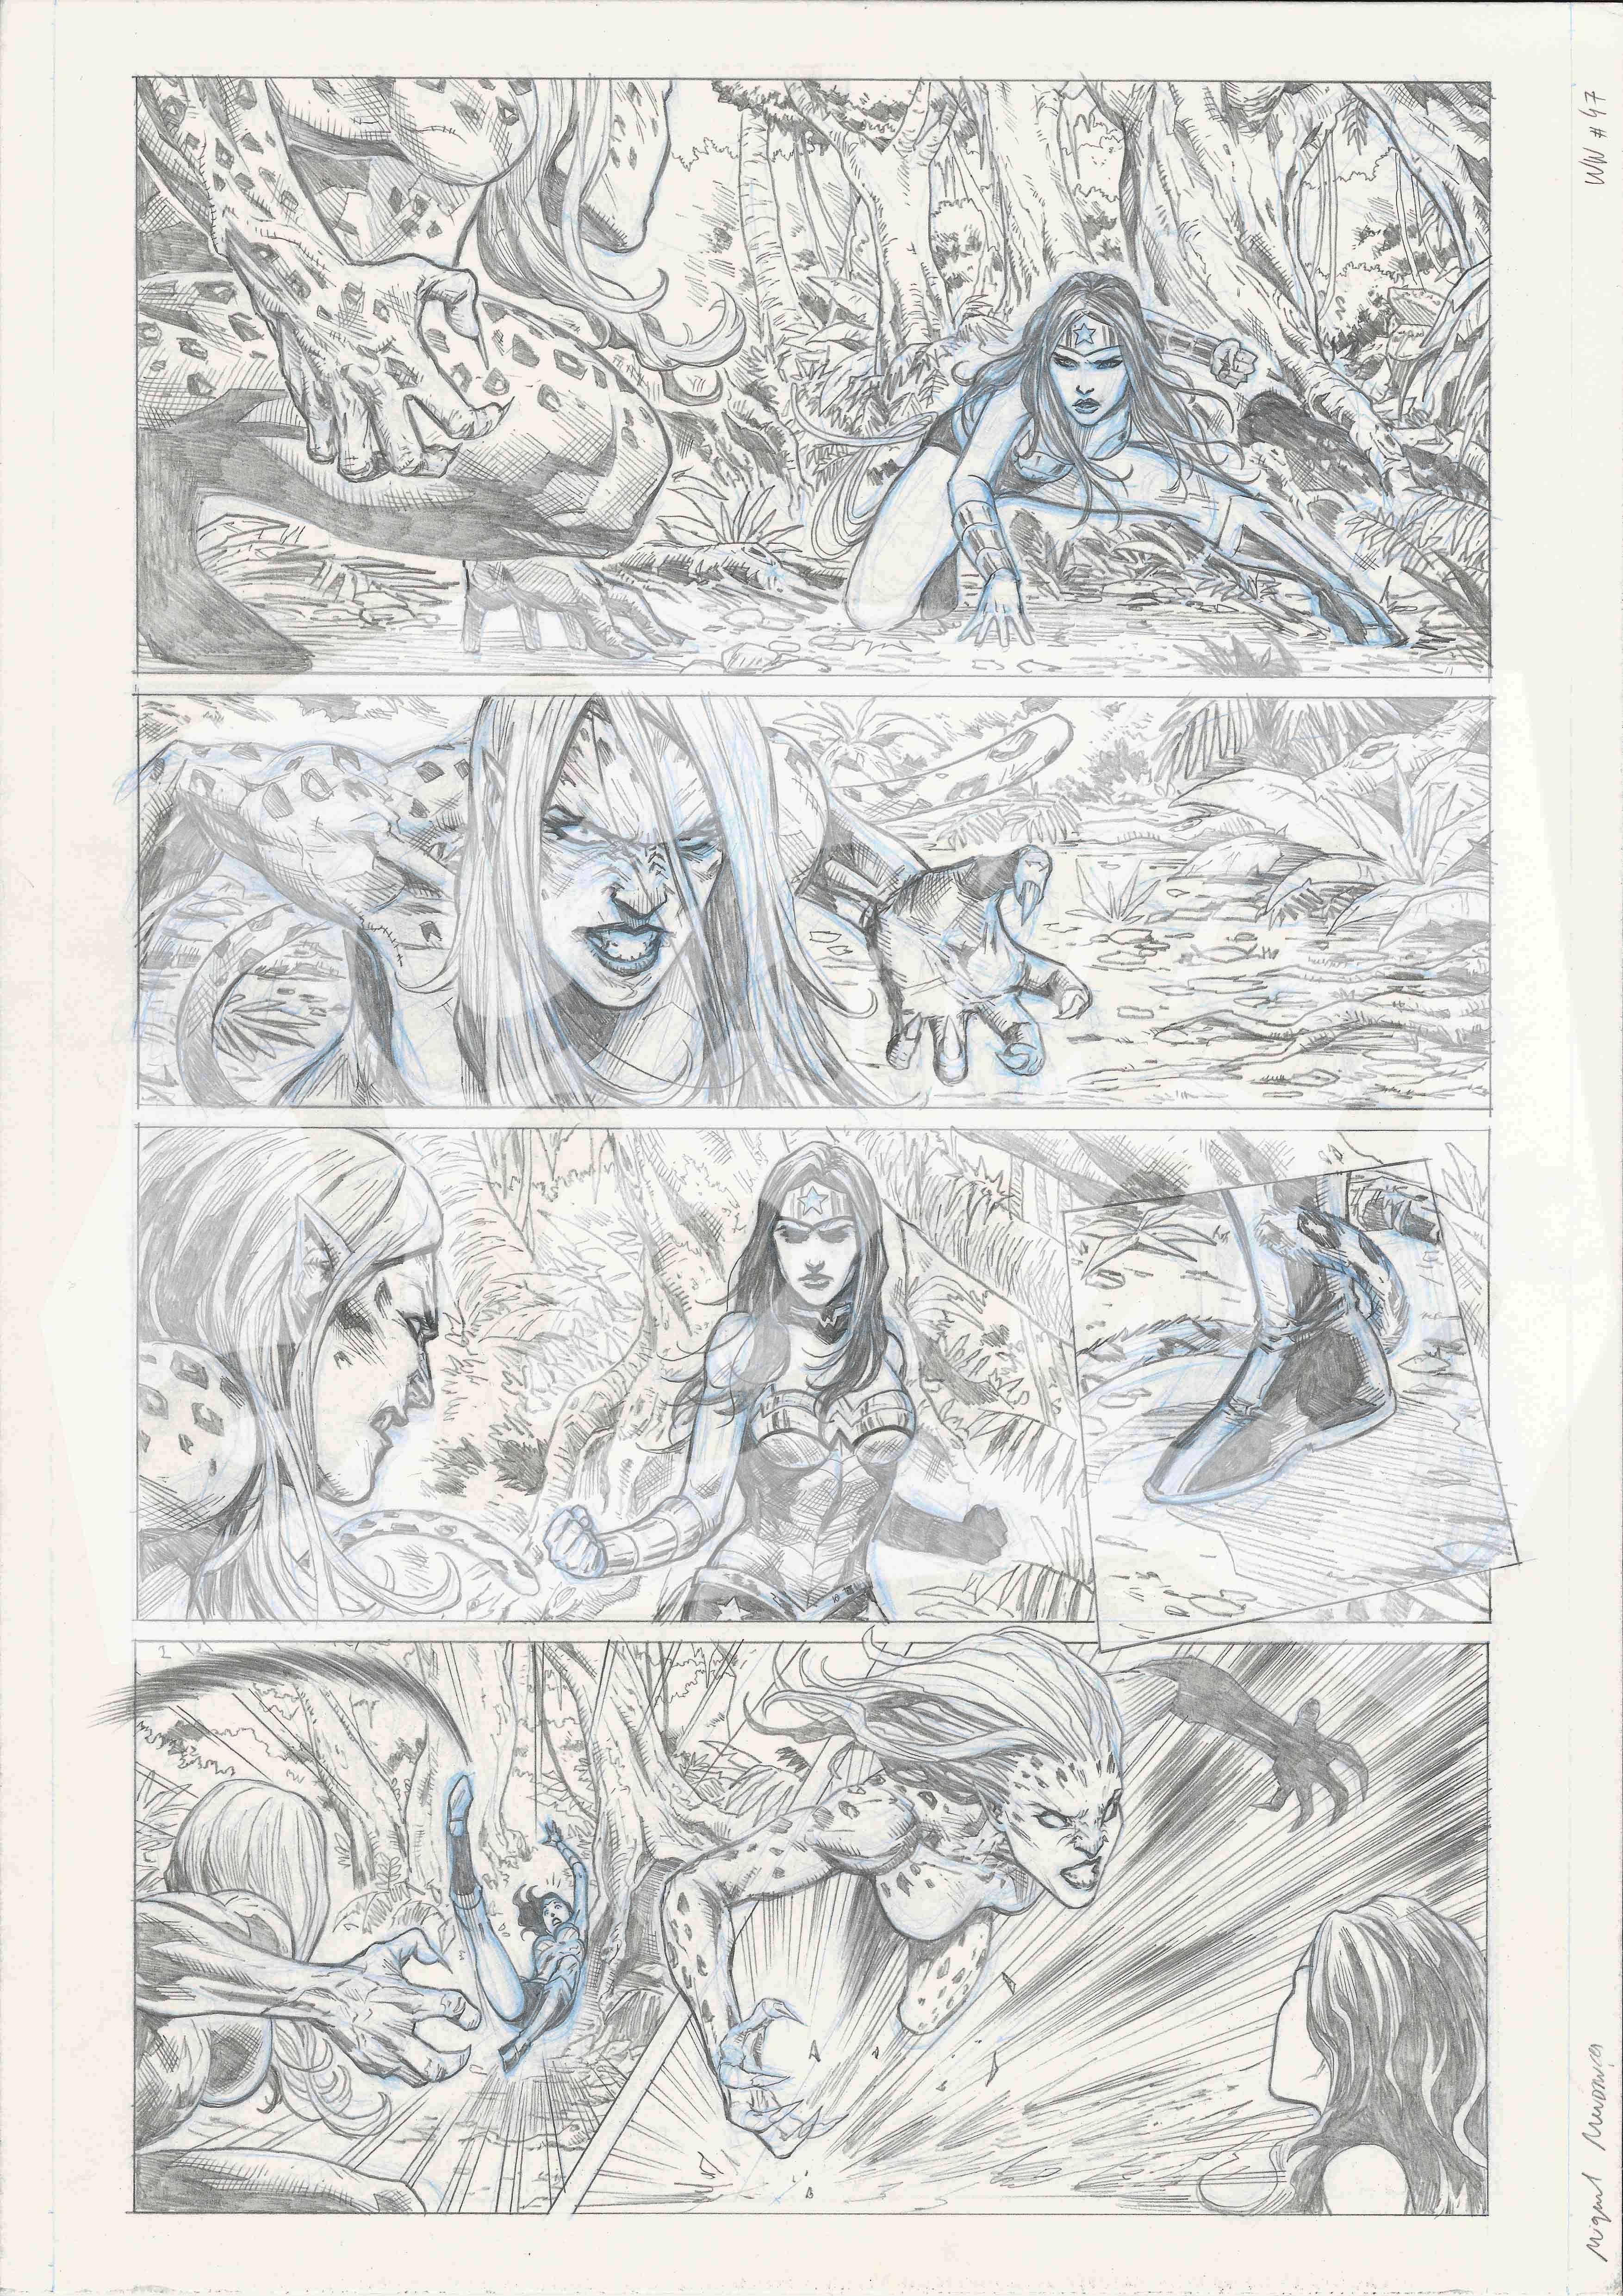 Wonder Woman #47 (page 15)